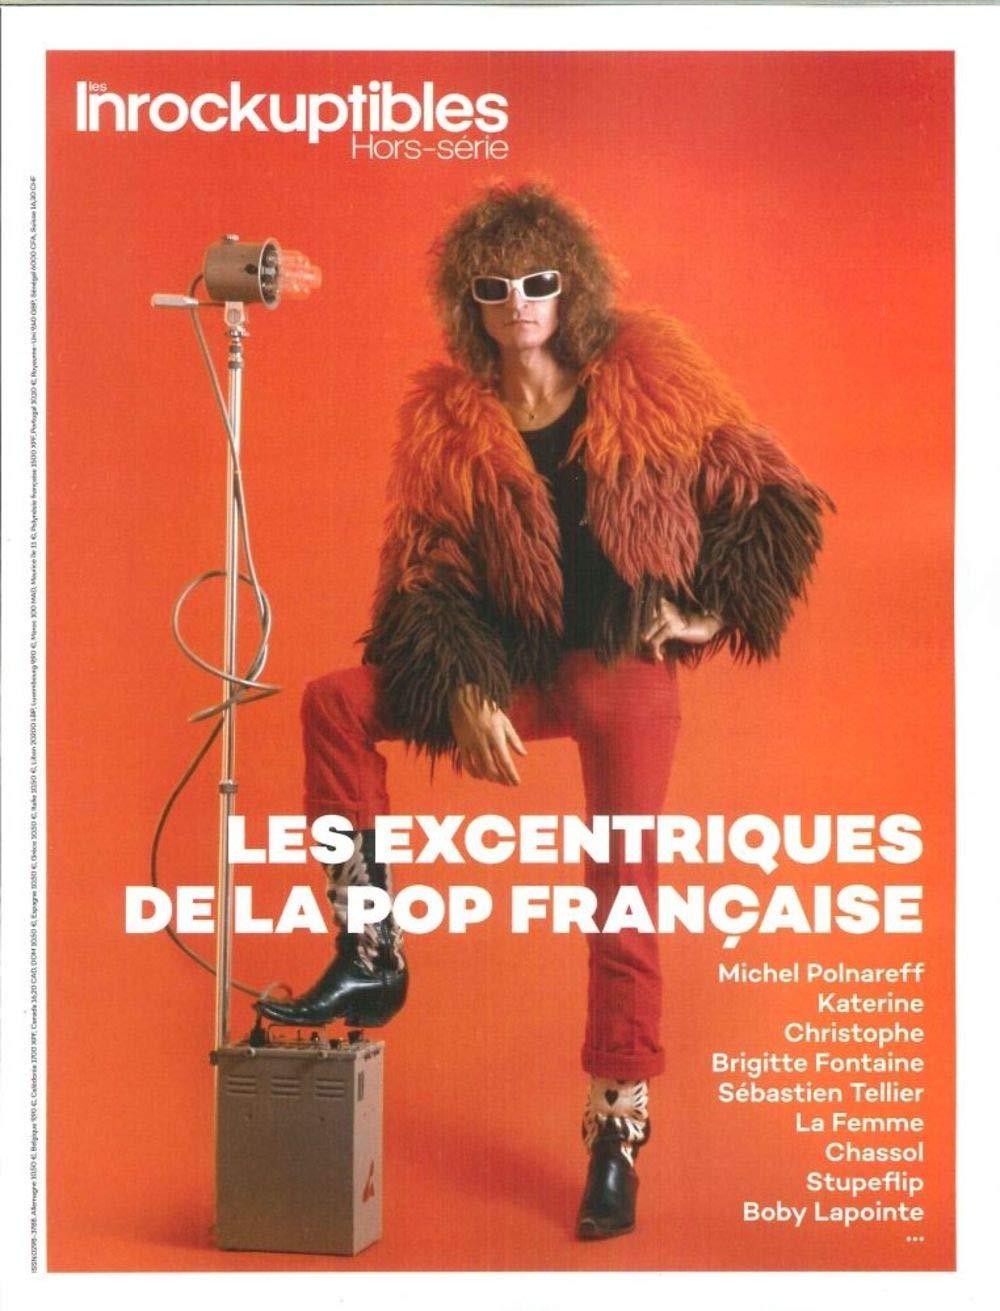 Música francesa e italiana, no sólo de rock vive el hombre... - Página 9 712+4dXAoGL